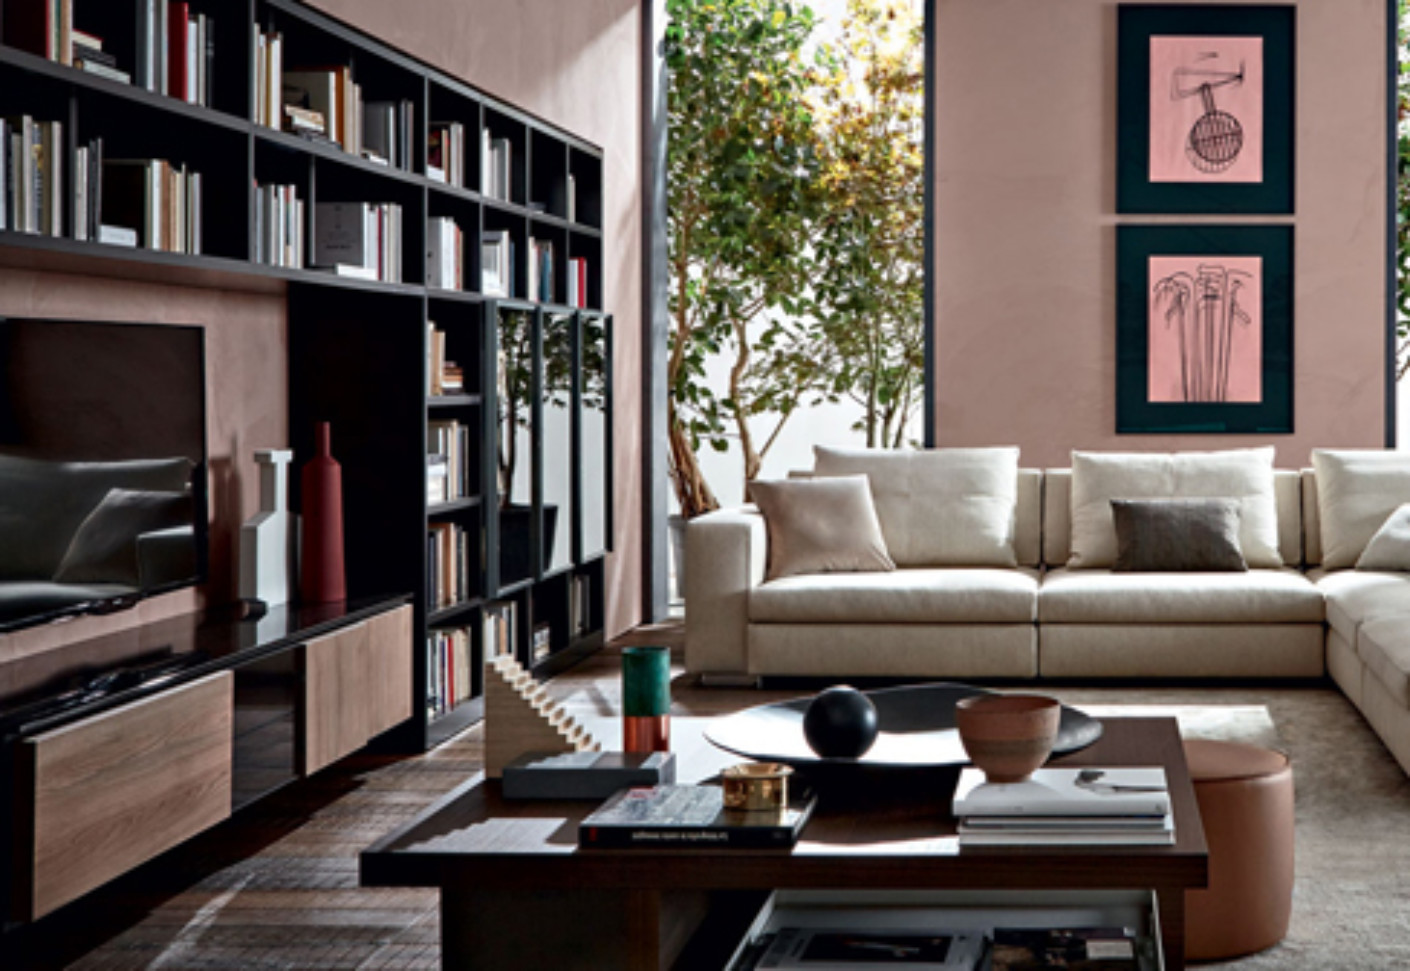 505 multimedia by molteni c stylepark. Black Bedroom Furniture Sets. Home Design Ideas